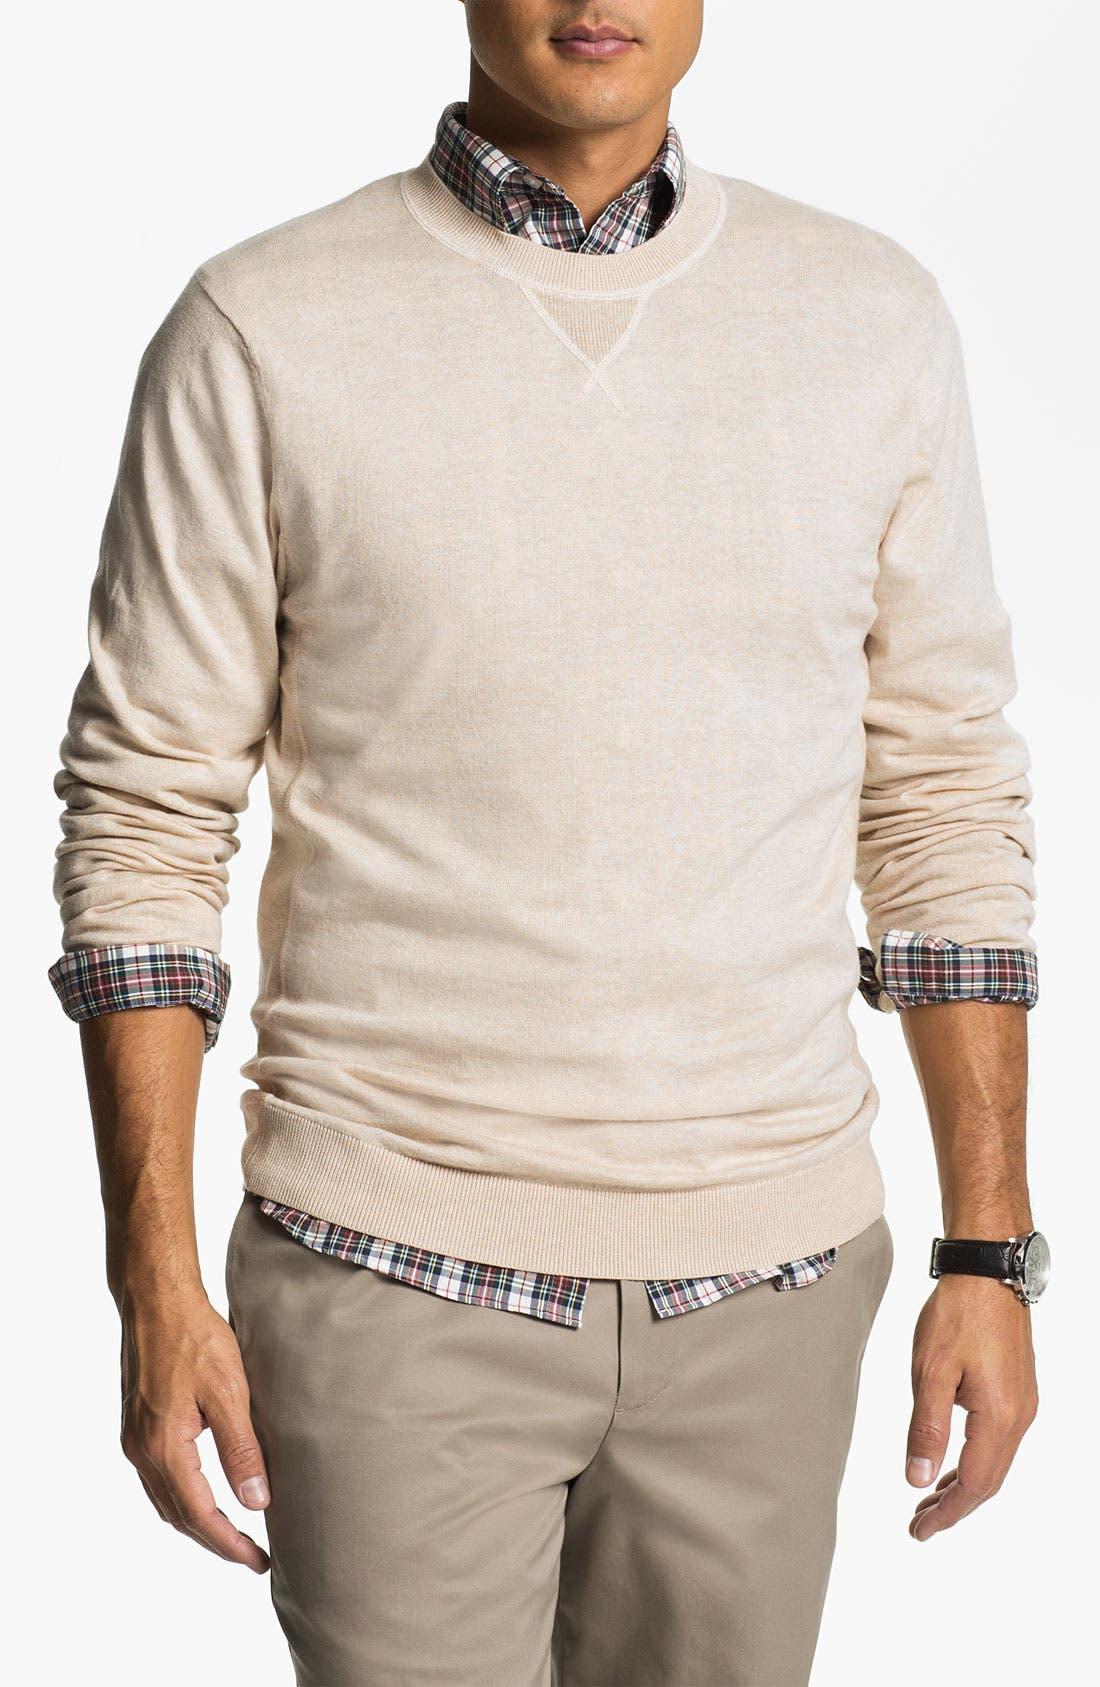 Main Image - Wallin & Bros. Pima Cotton Blend Sweater